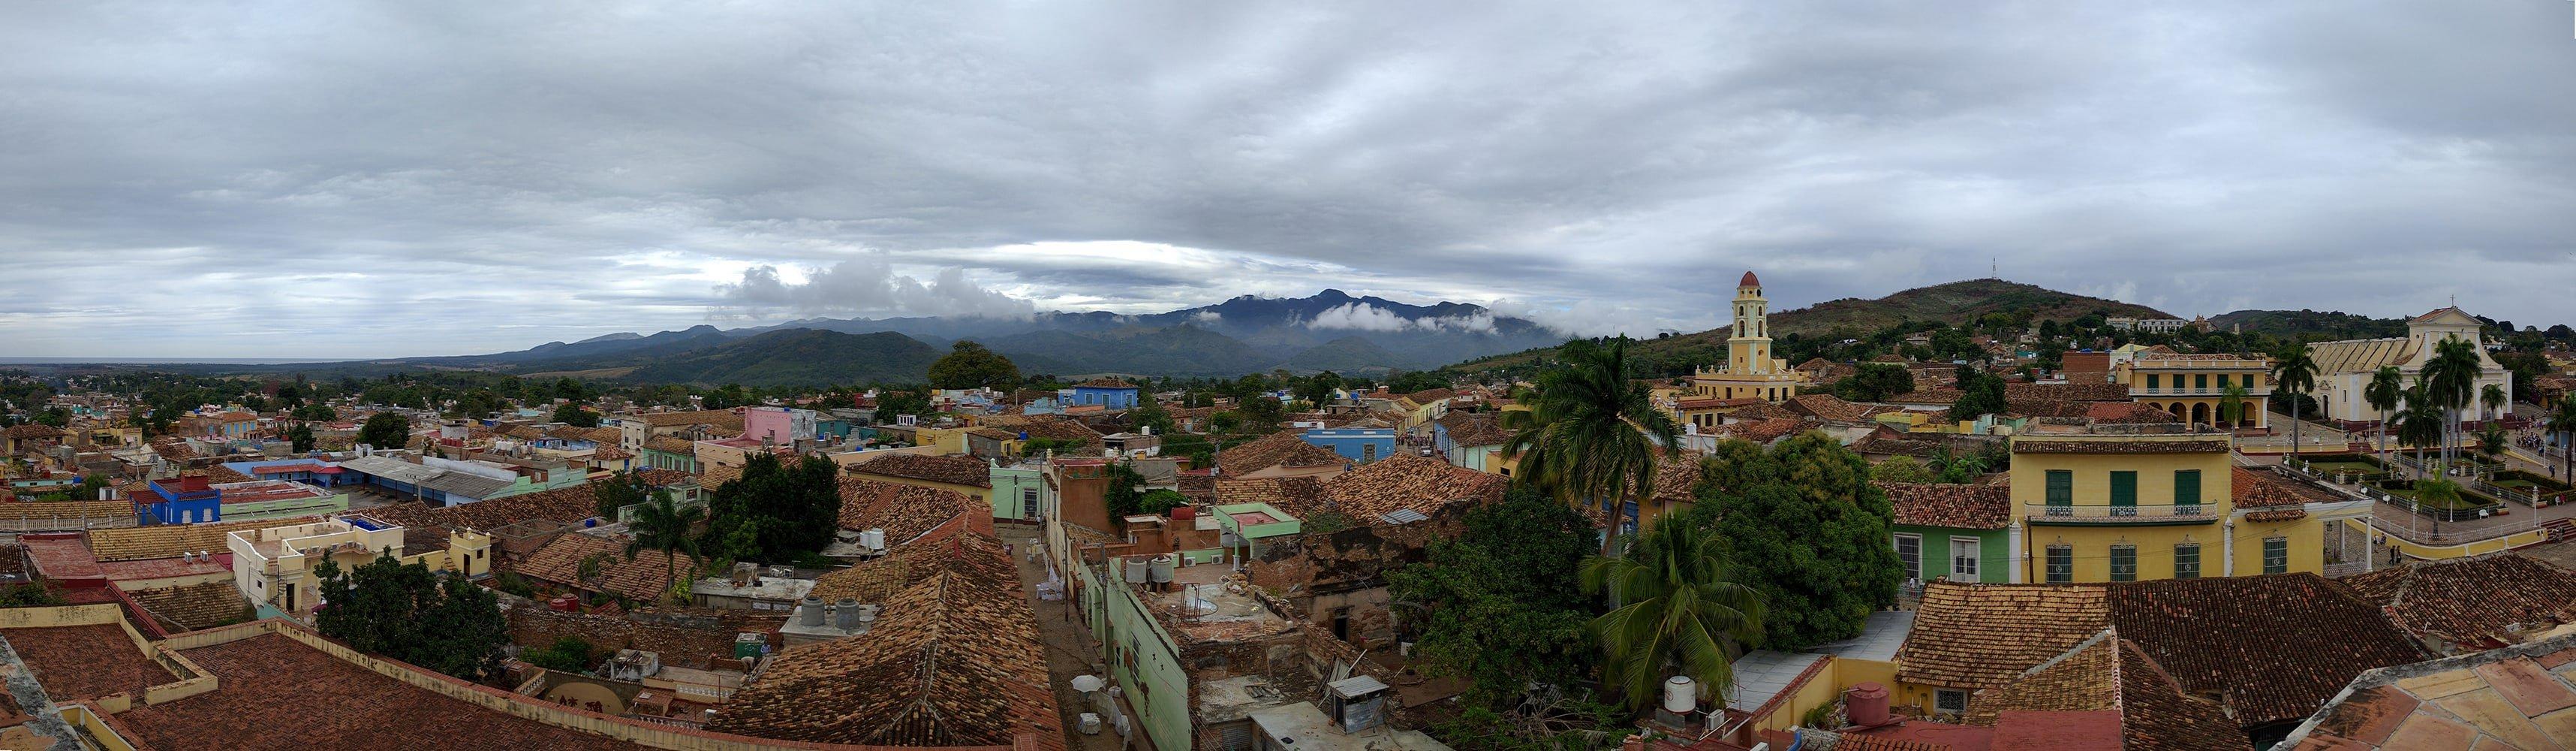 Trinidad Cuba Church and Mountains